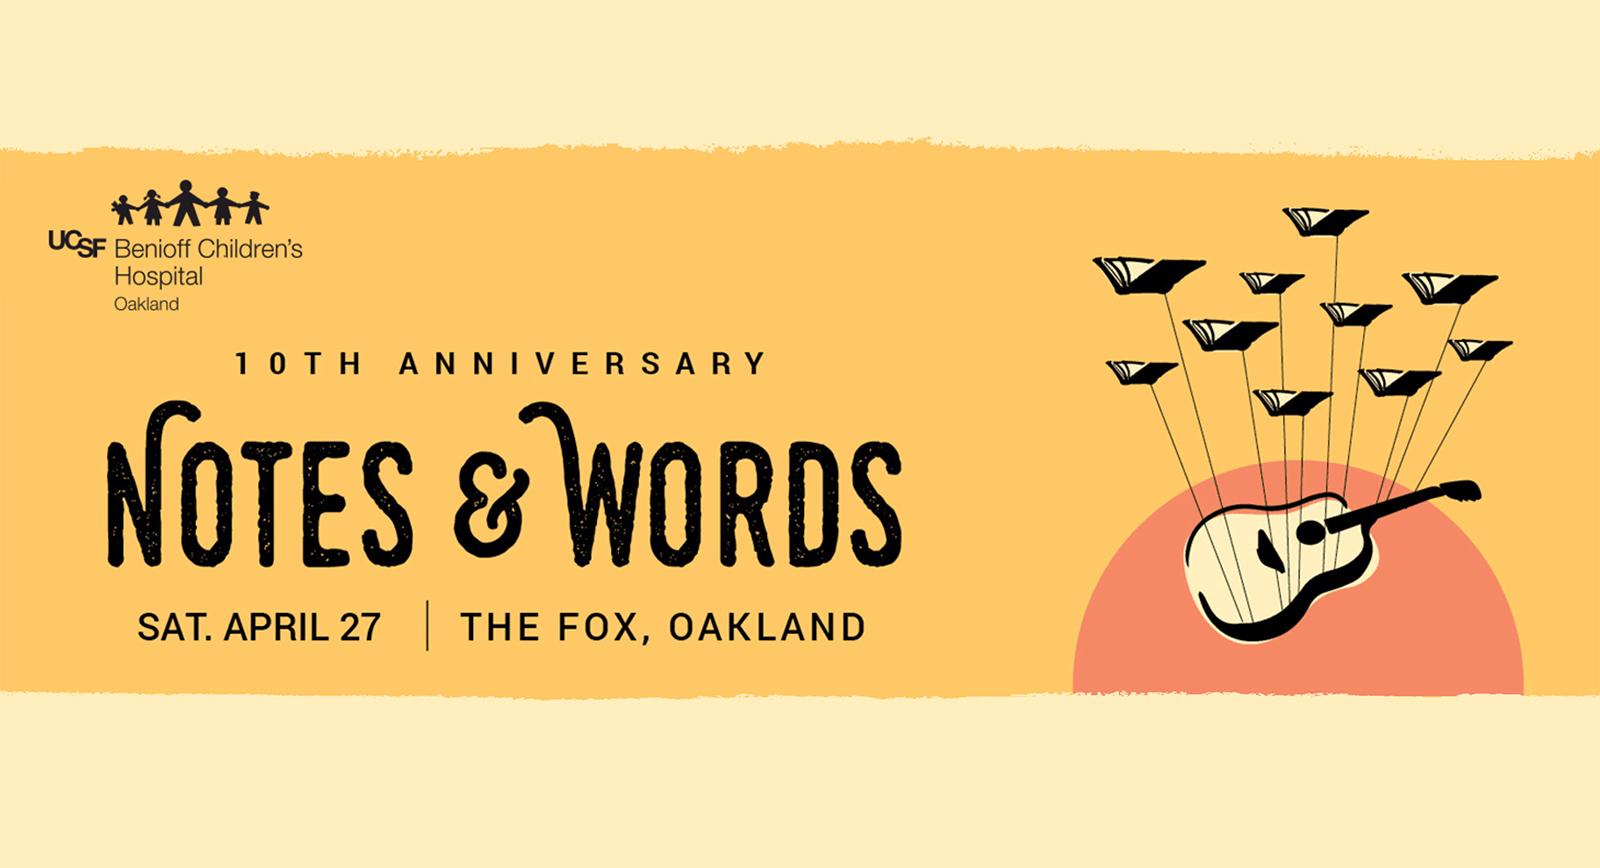 Ryan Tedder to Headline Notes & Words 10th Anniversary